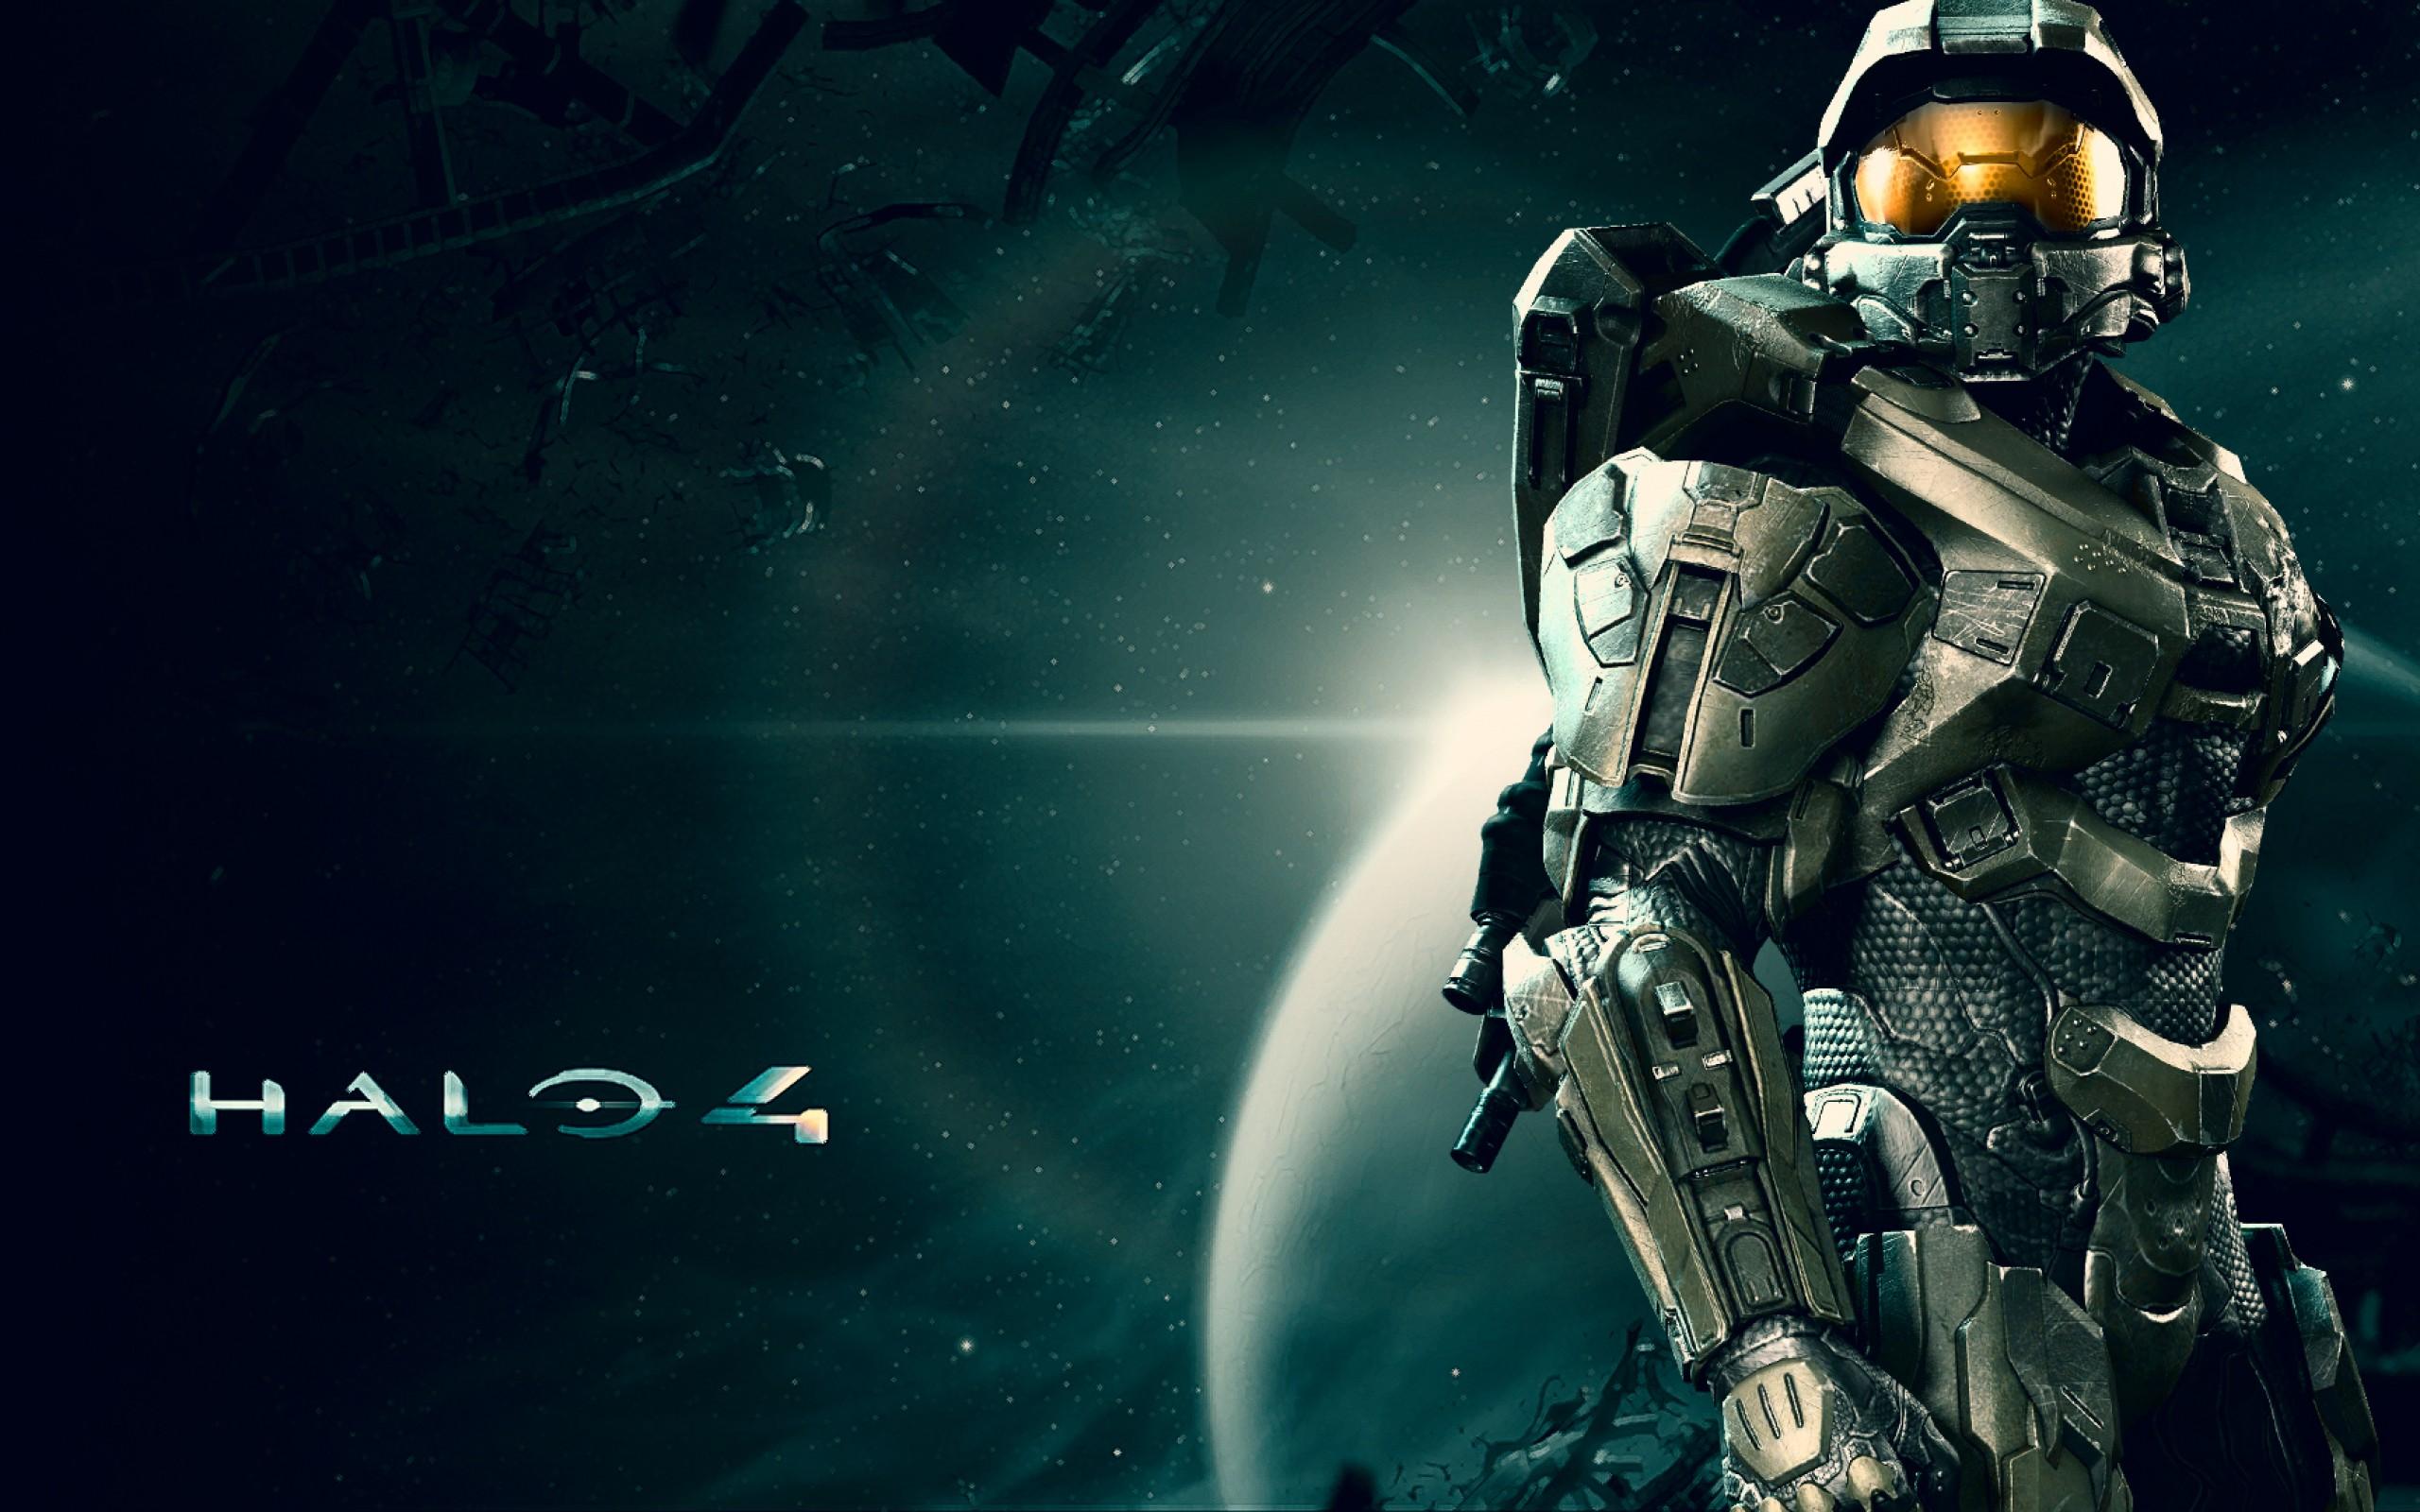 Halo 5 wallpaper 1080p 2560x1600